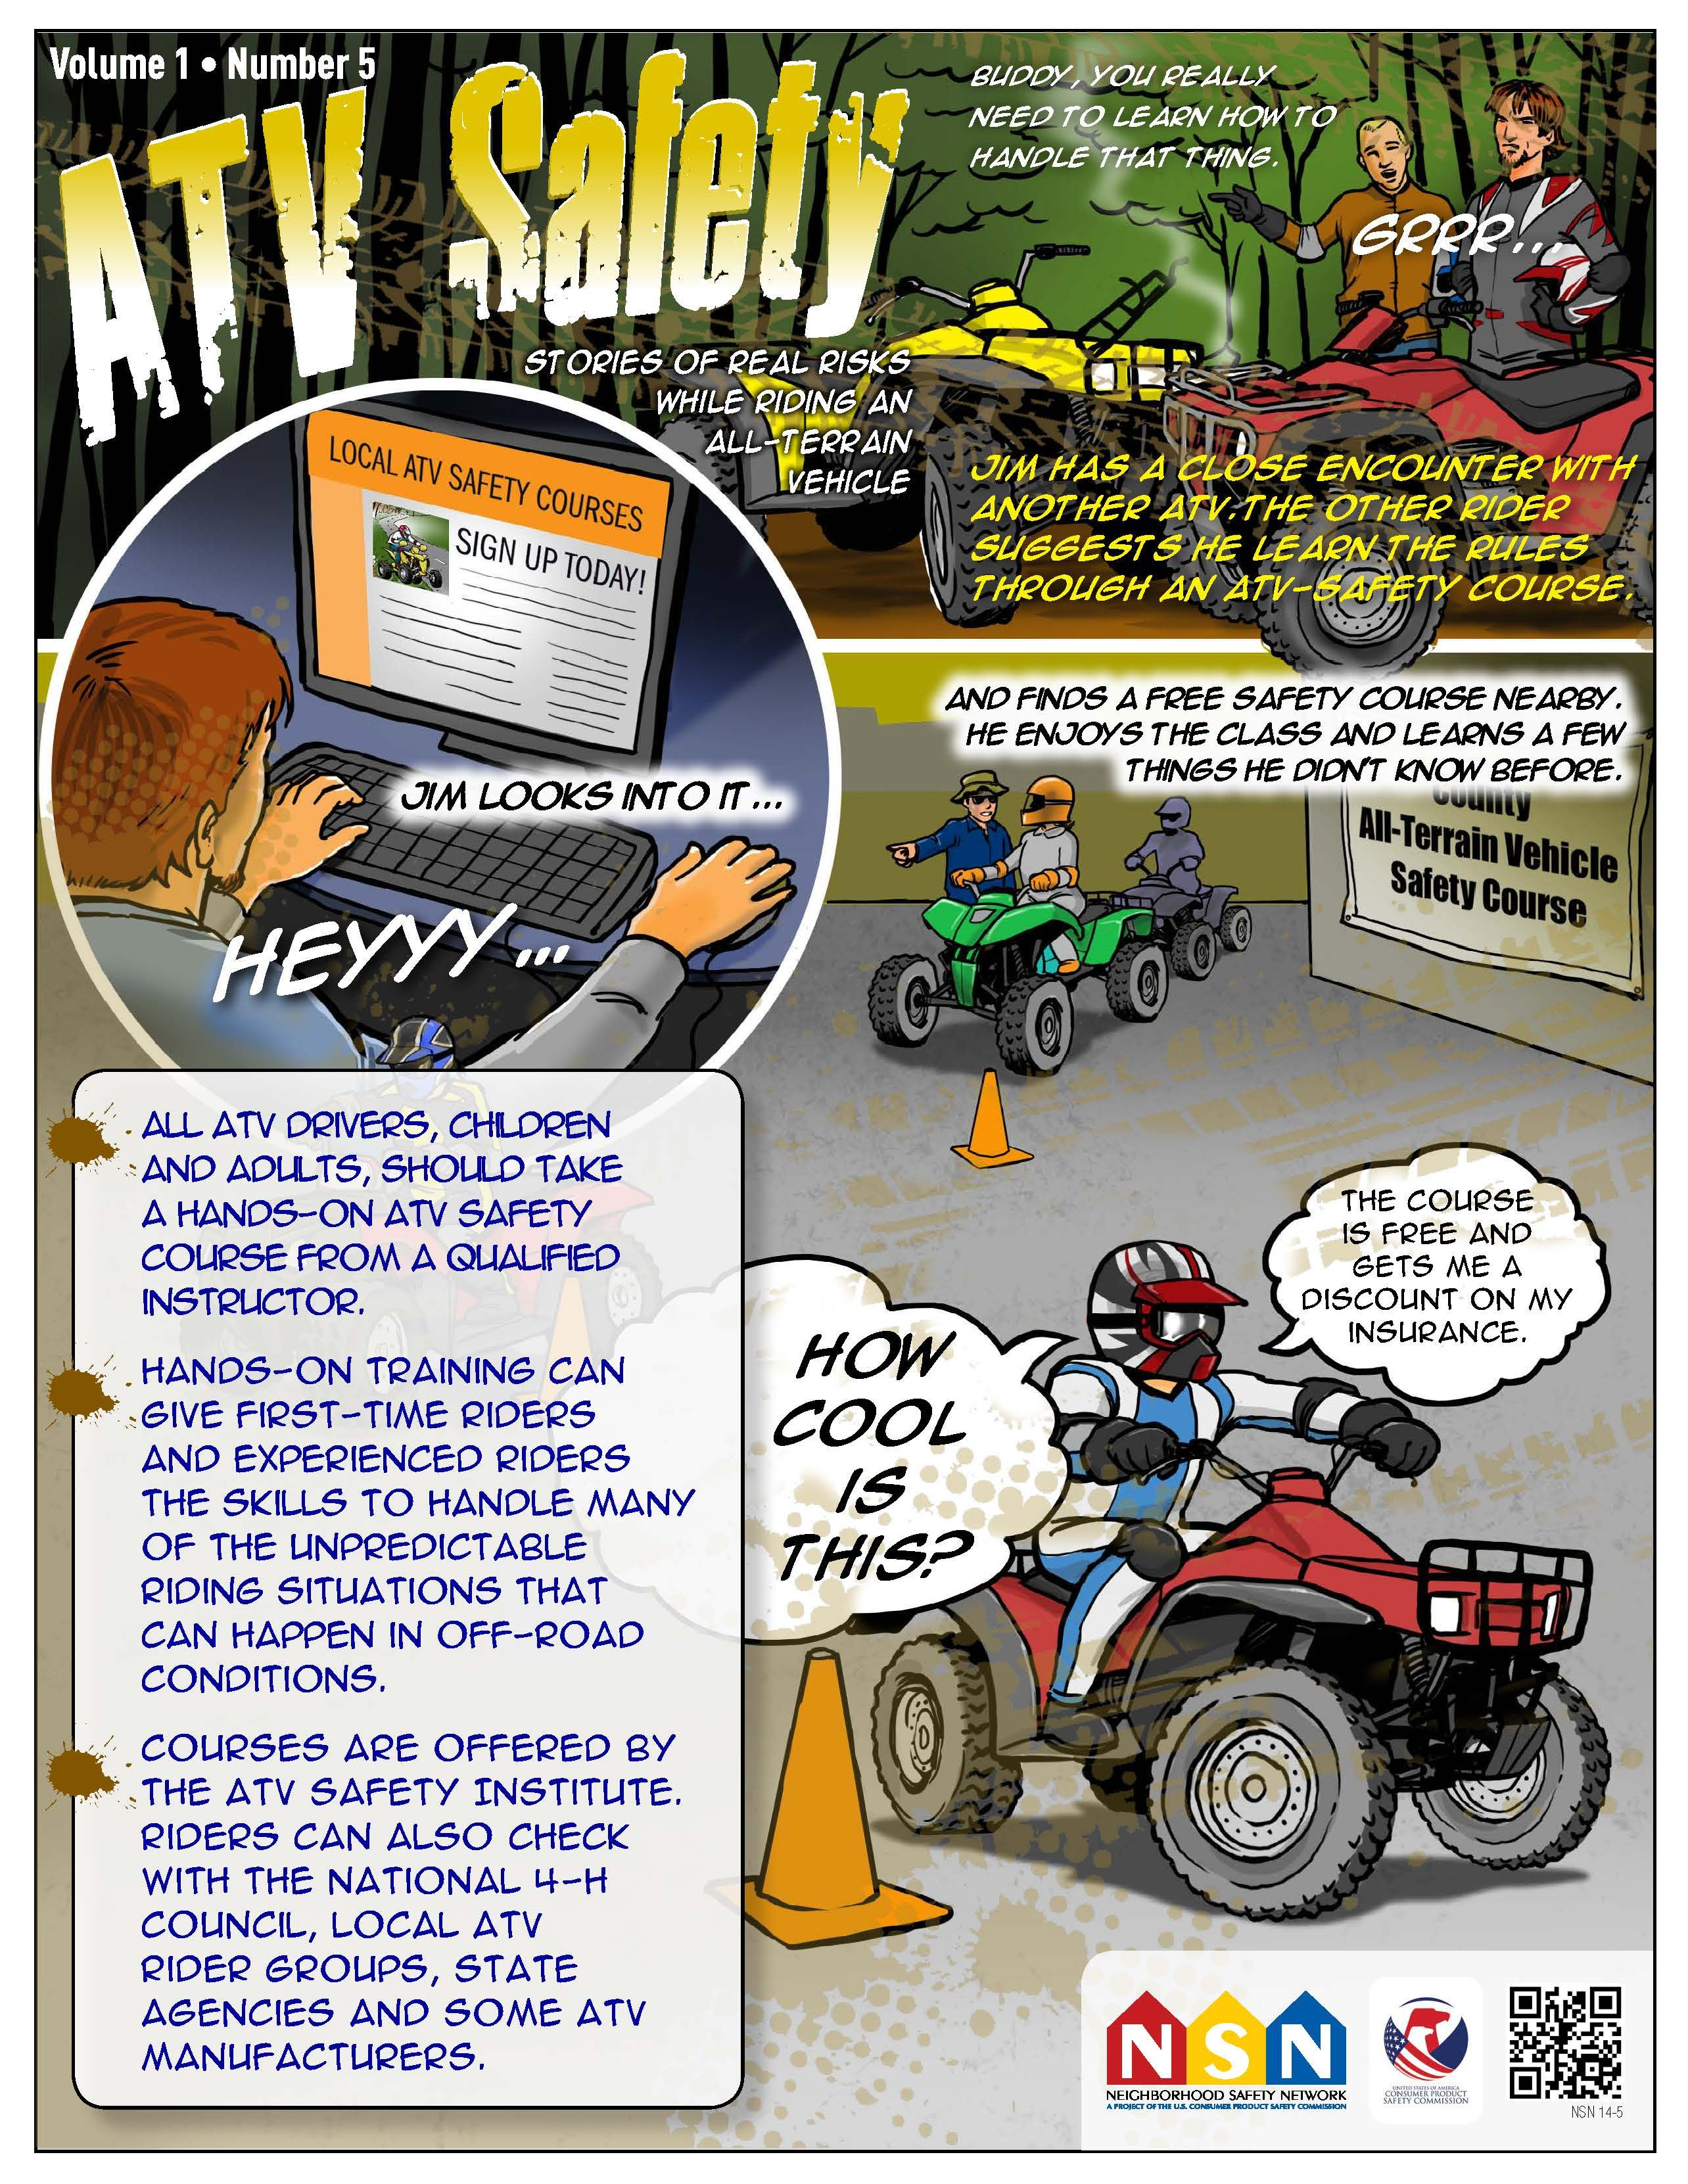 ATV Safety Comic Take a Safety Course Safety courses